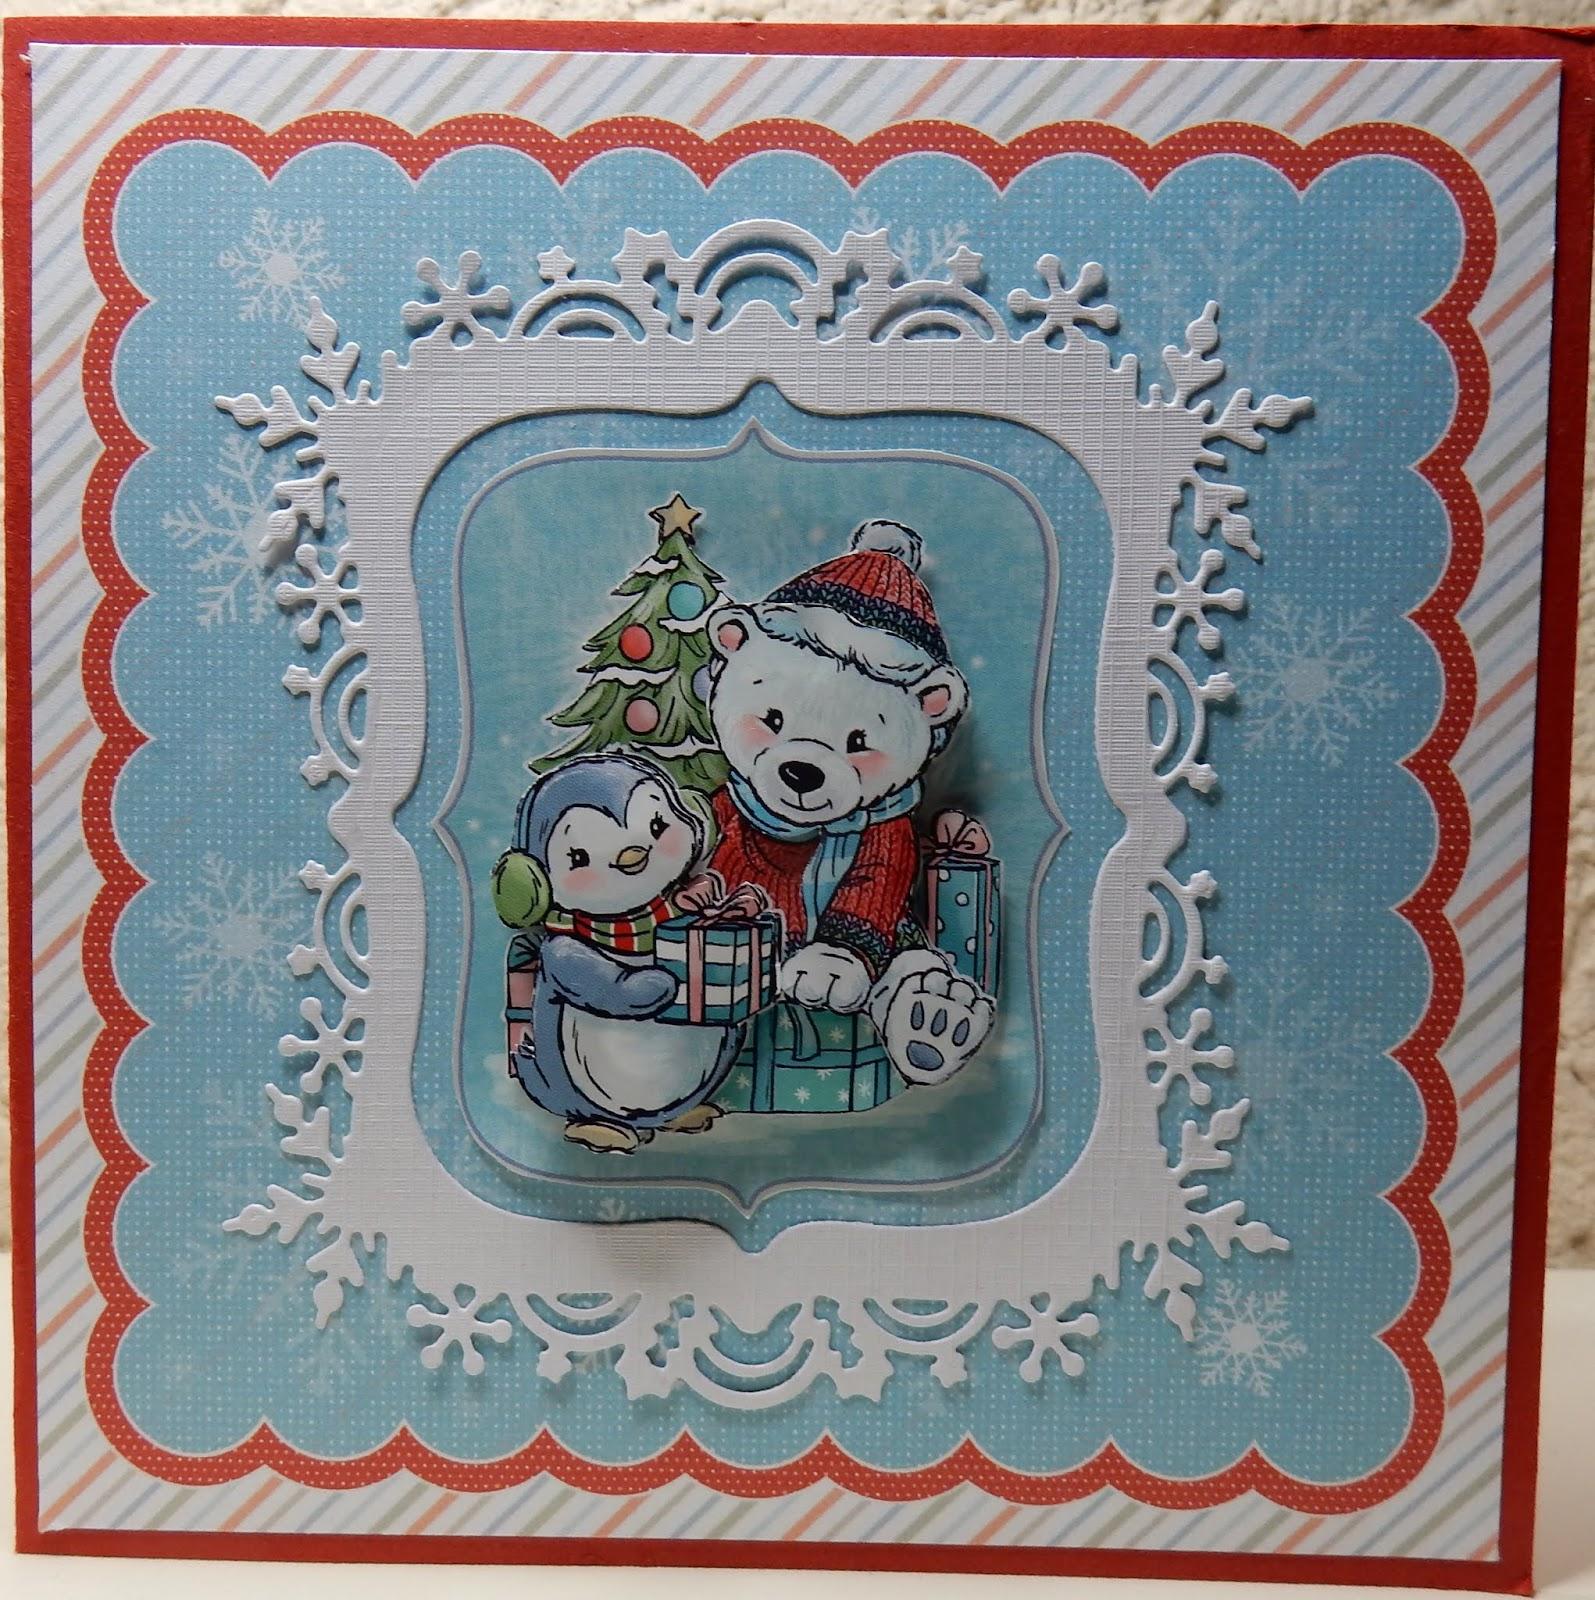 Uitzonderlijk Hetty's Knutselhokkie!: Yvonne Creations Christmas Dreams &MW91